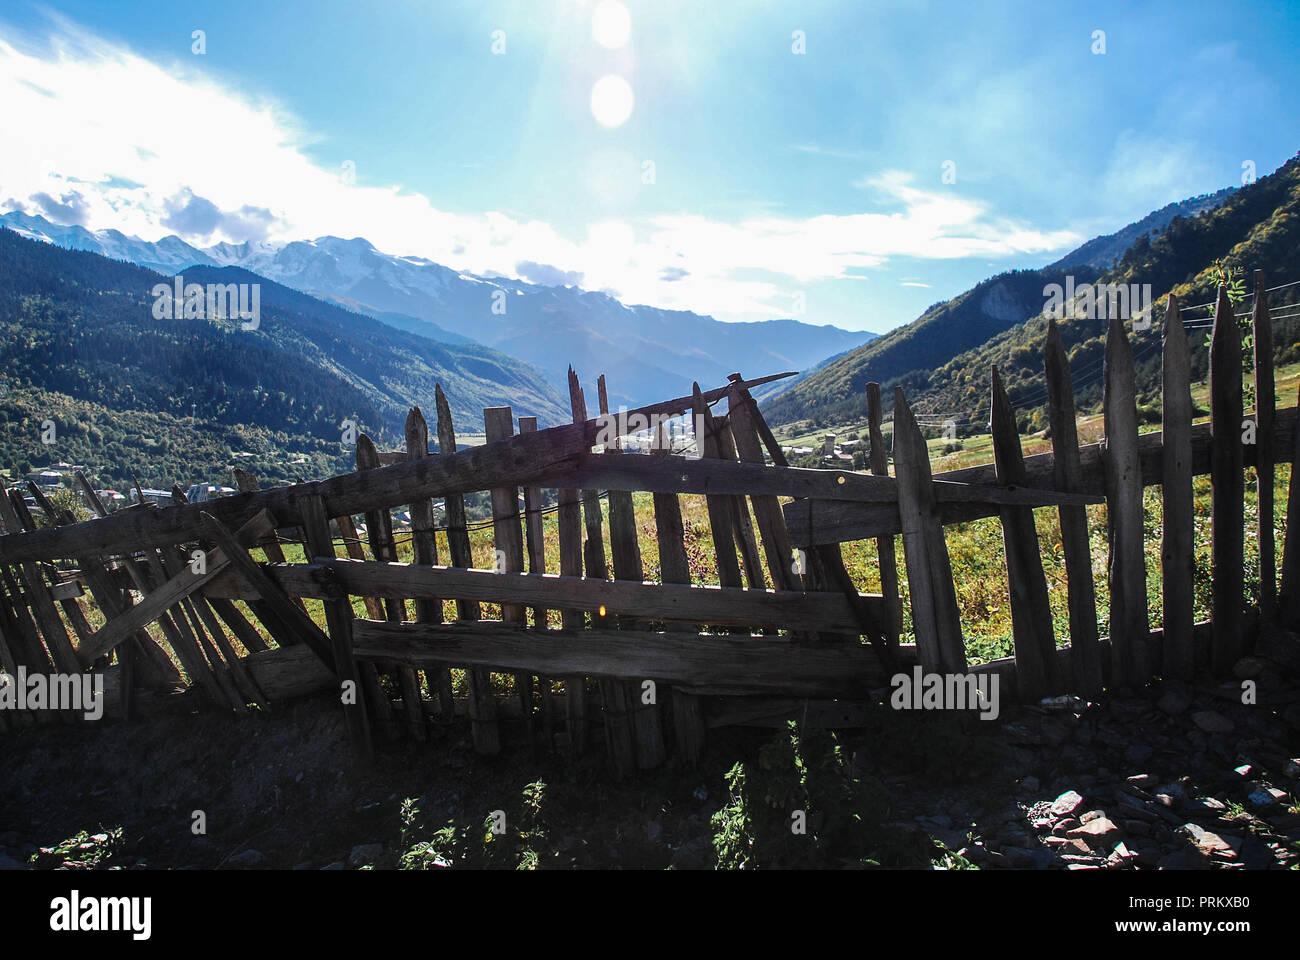 Crooked wooden fence on a sunny mountain landscape in Mestia, Svaneti, Georgia Stock Photo